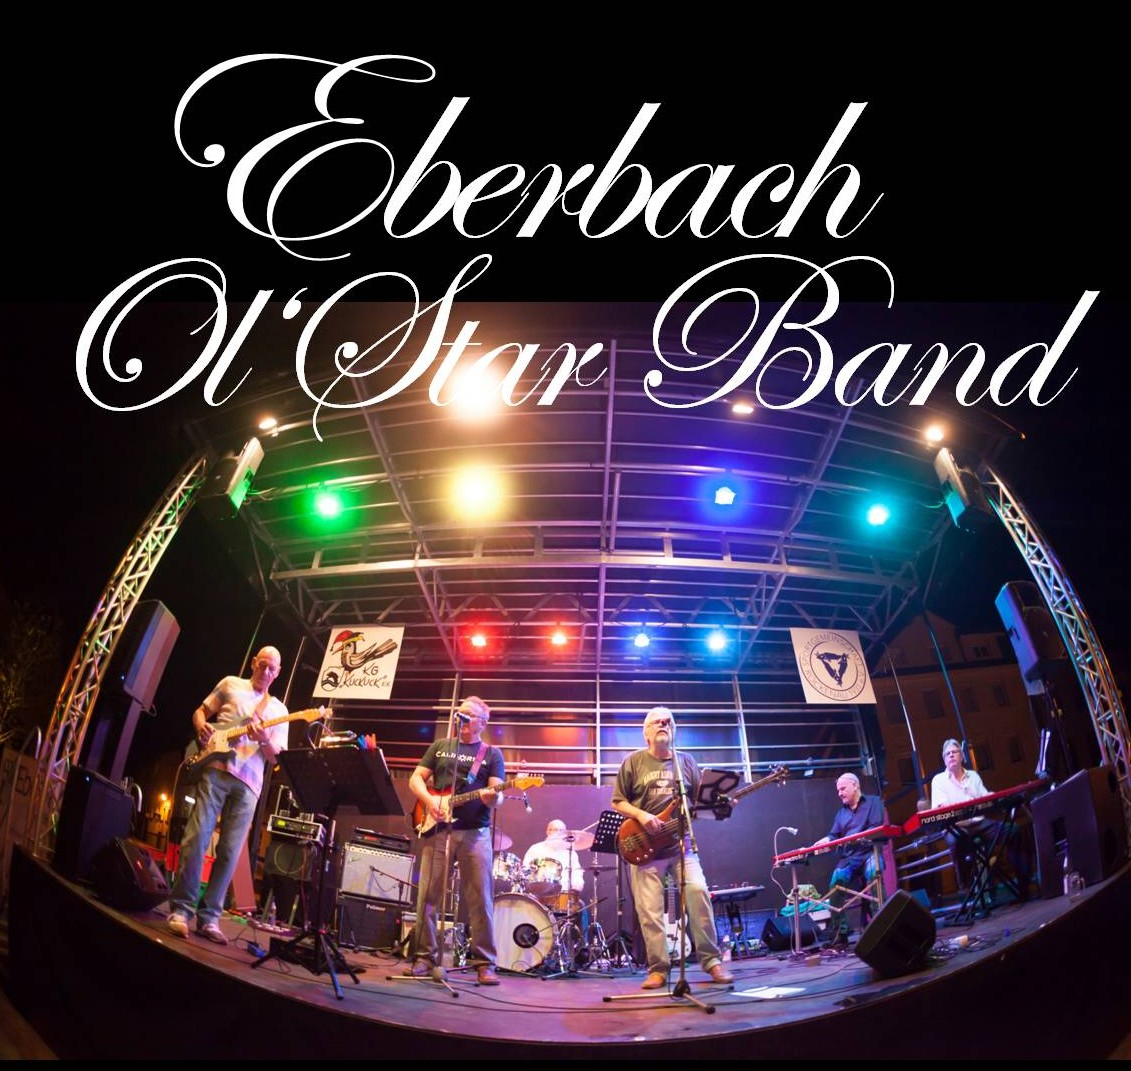 Eberbach Ol'Star Band im Kulturlabor